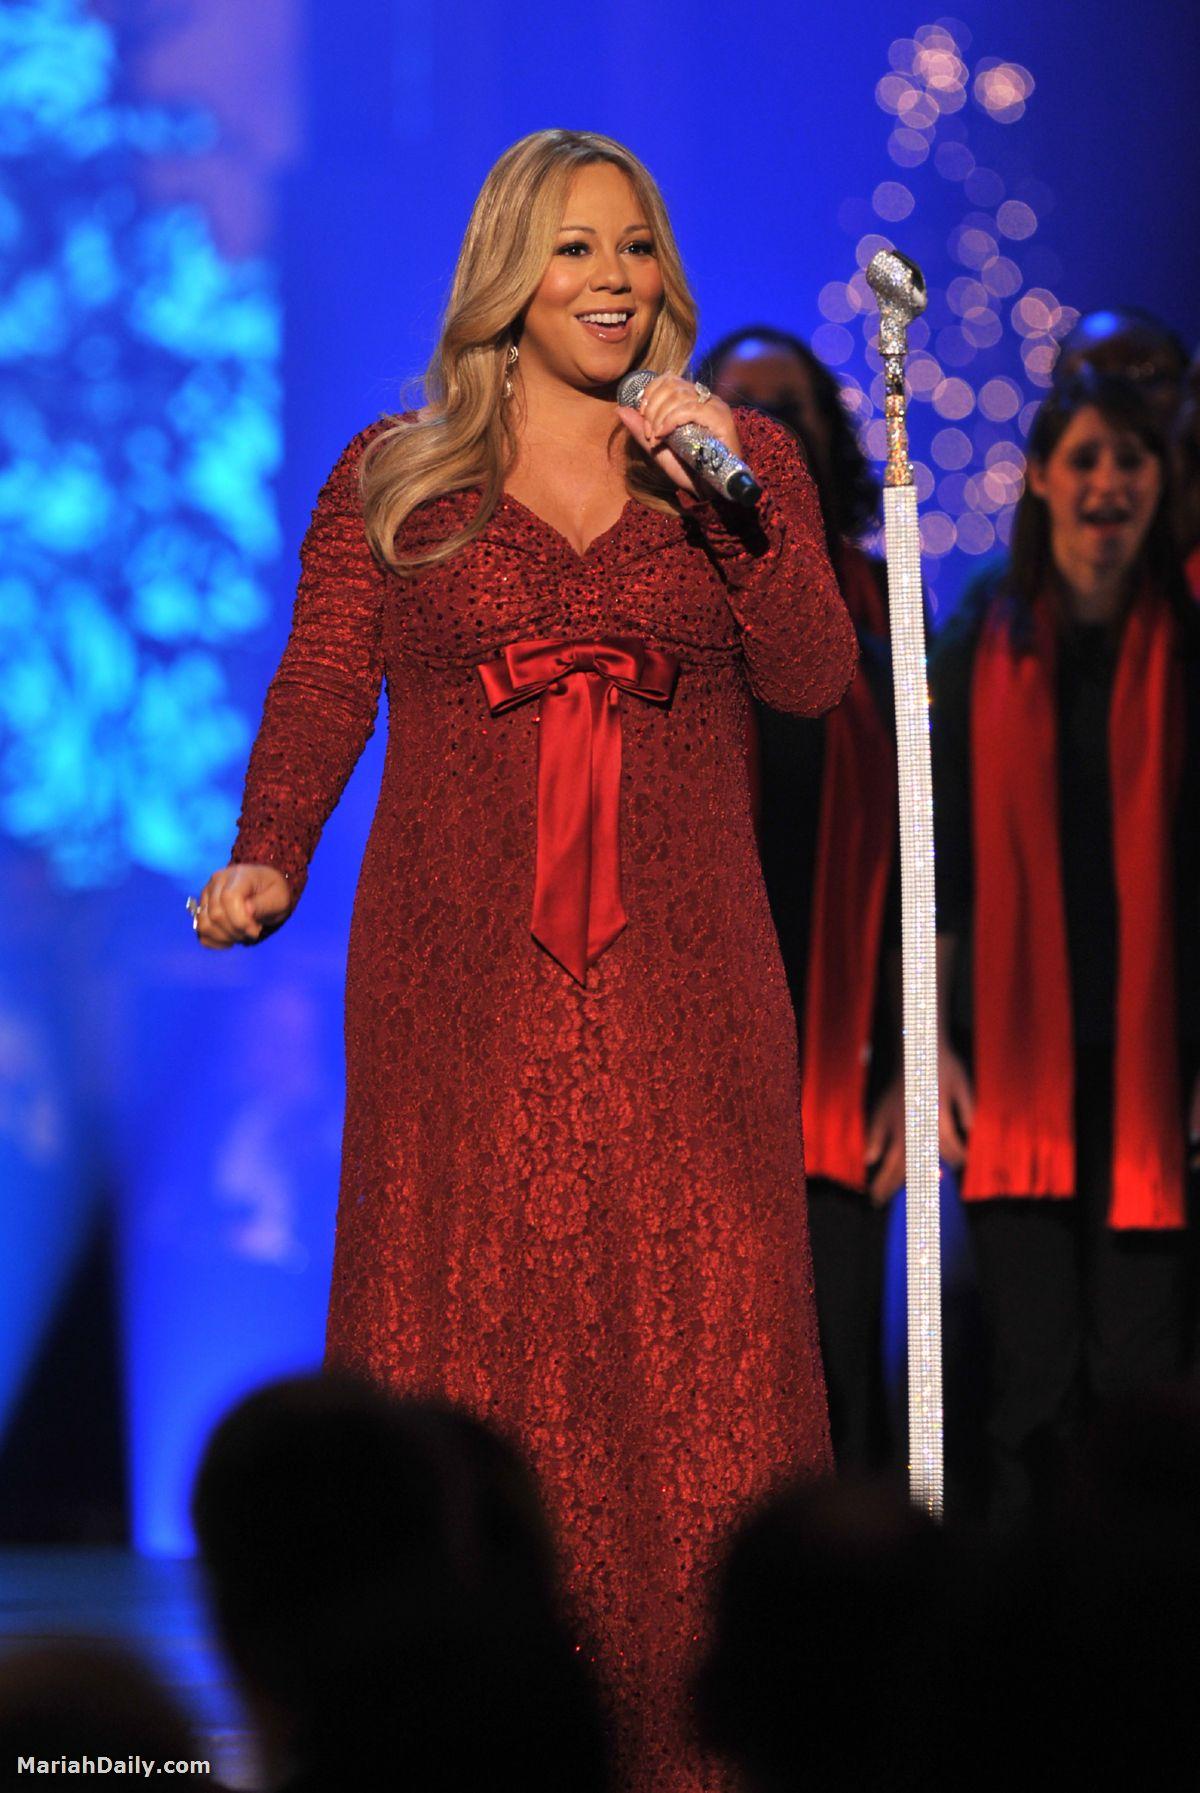 Mariah Carey Performs 'One Child' In Washington - That Grape Juice ...